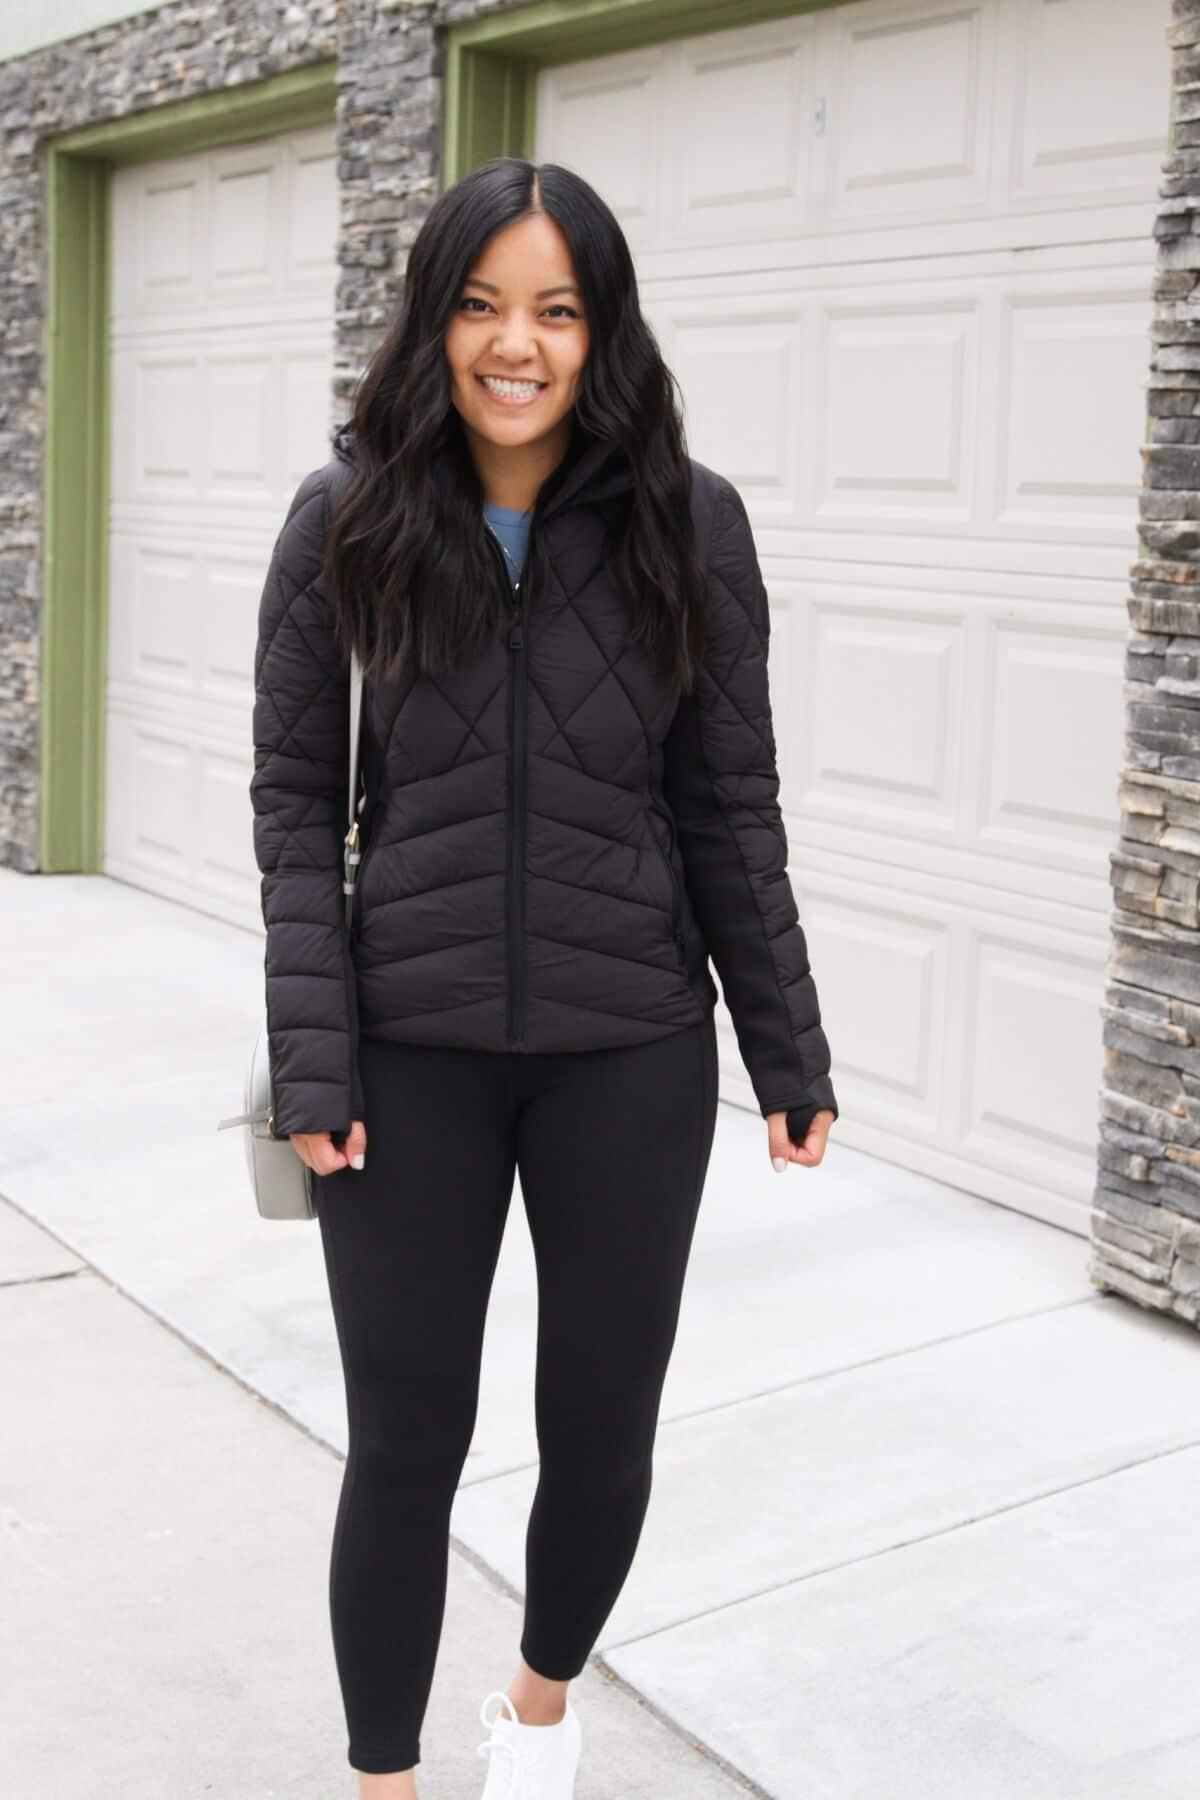 Athleisure Casual Outfit: blue sweatshirt + black leggings + black puffer jacket + white sneakers + gray small crossbody bag